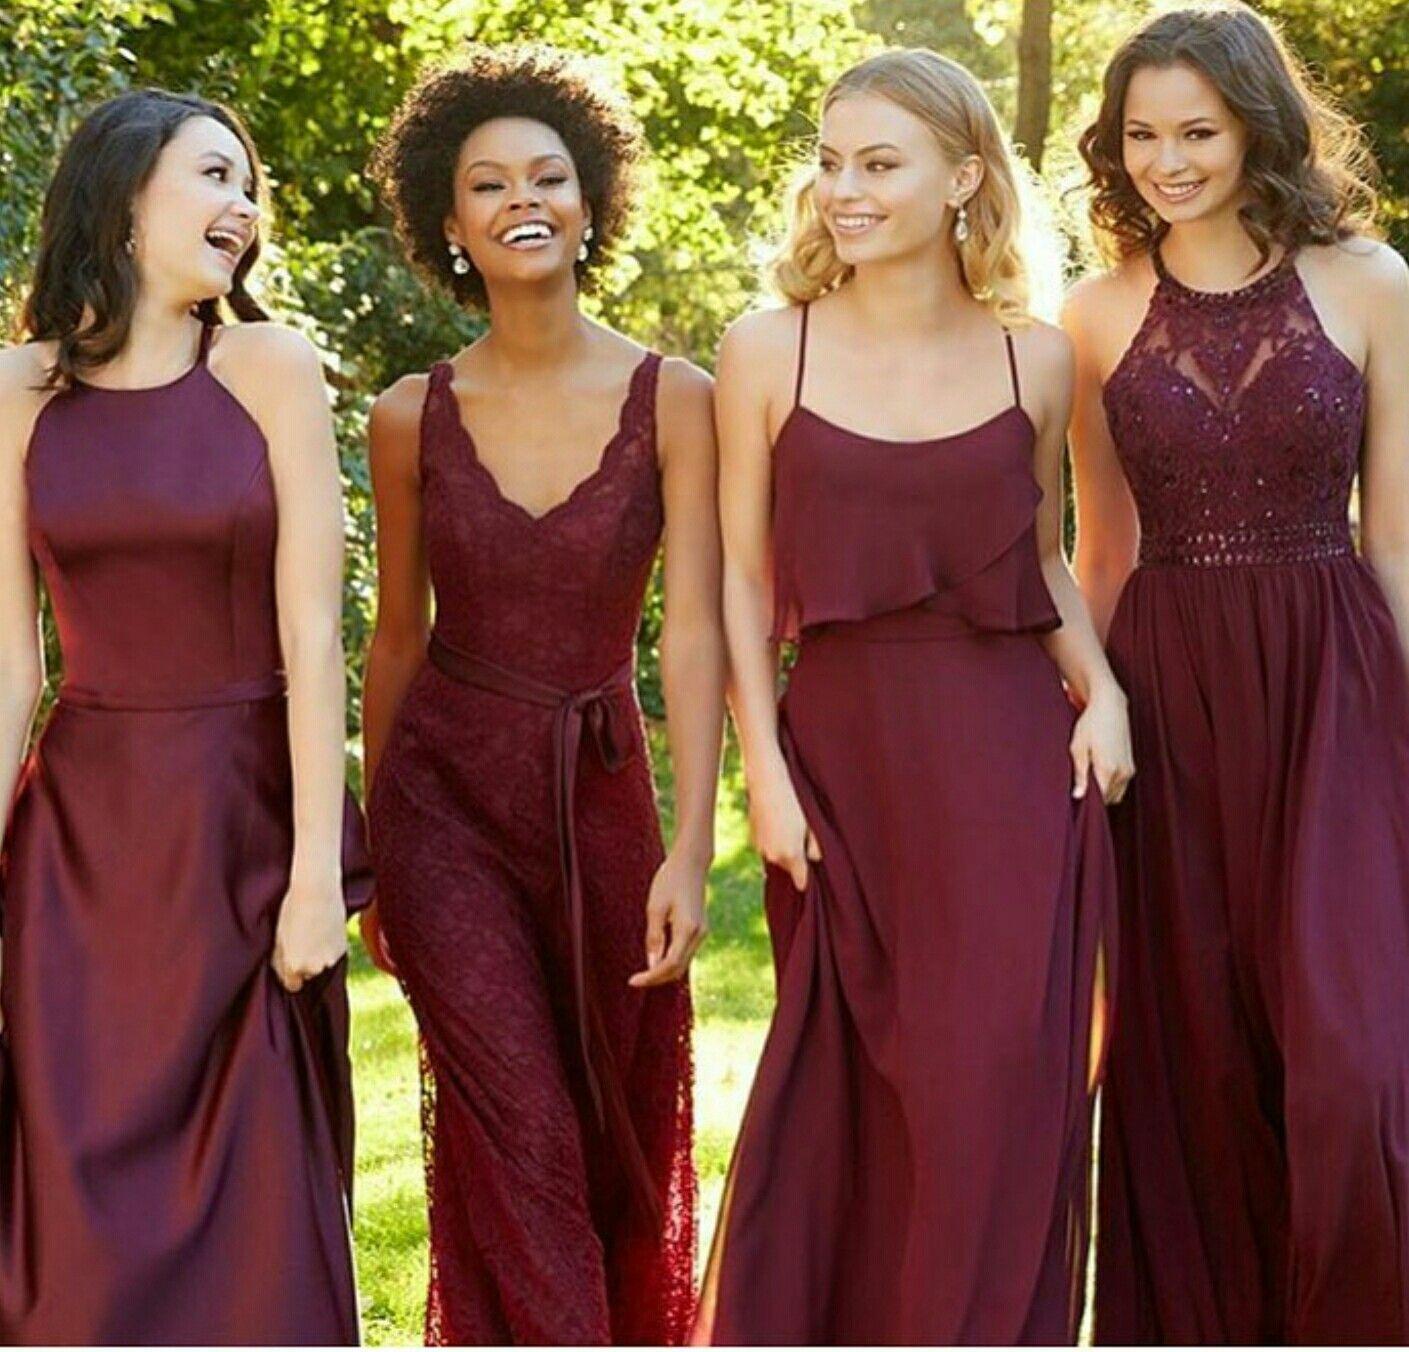 Love The Different Dresses! #bridesmaids   Trauzeugin Kleid